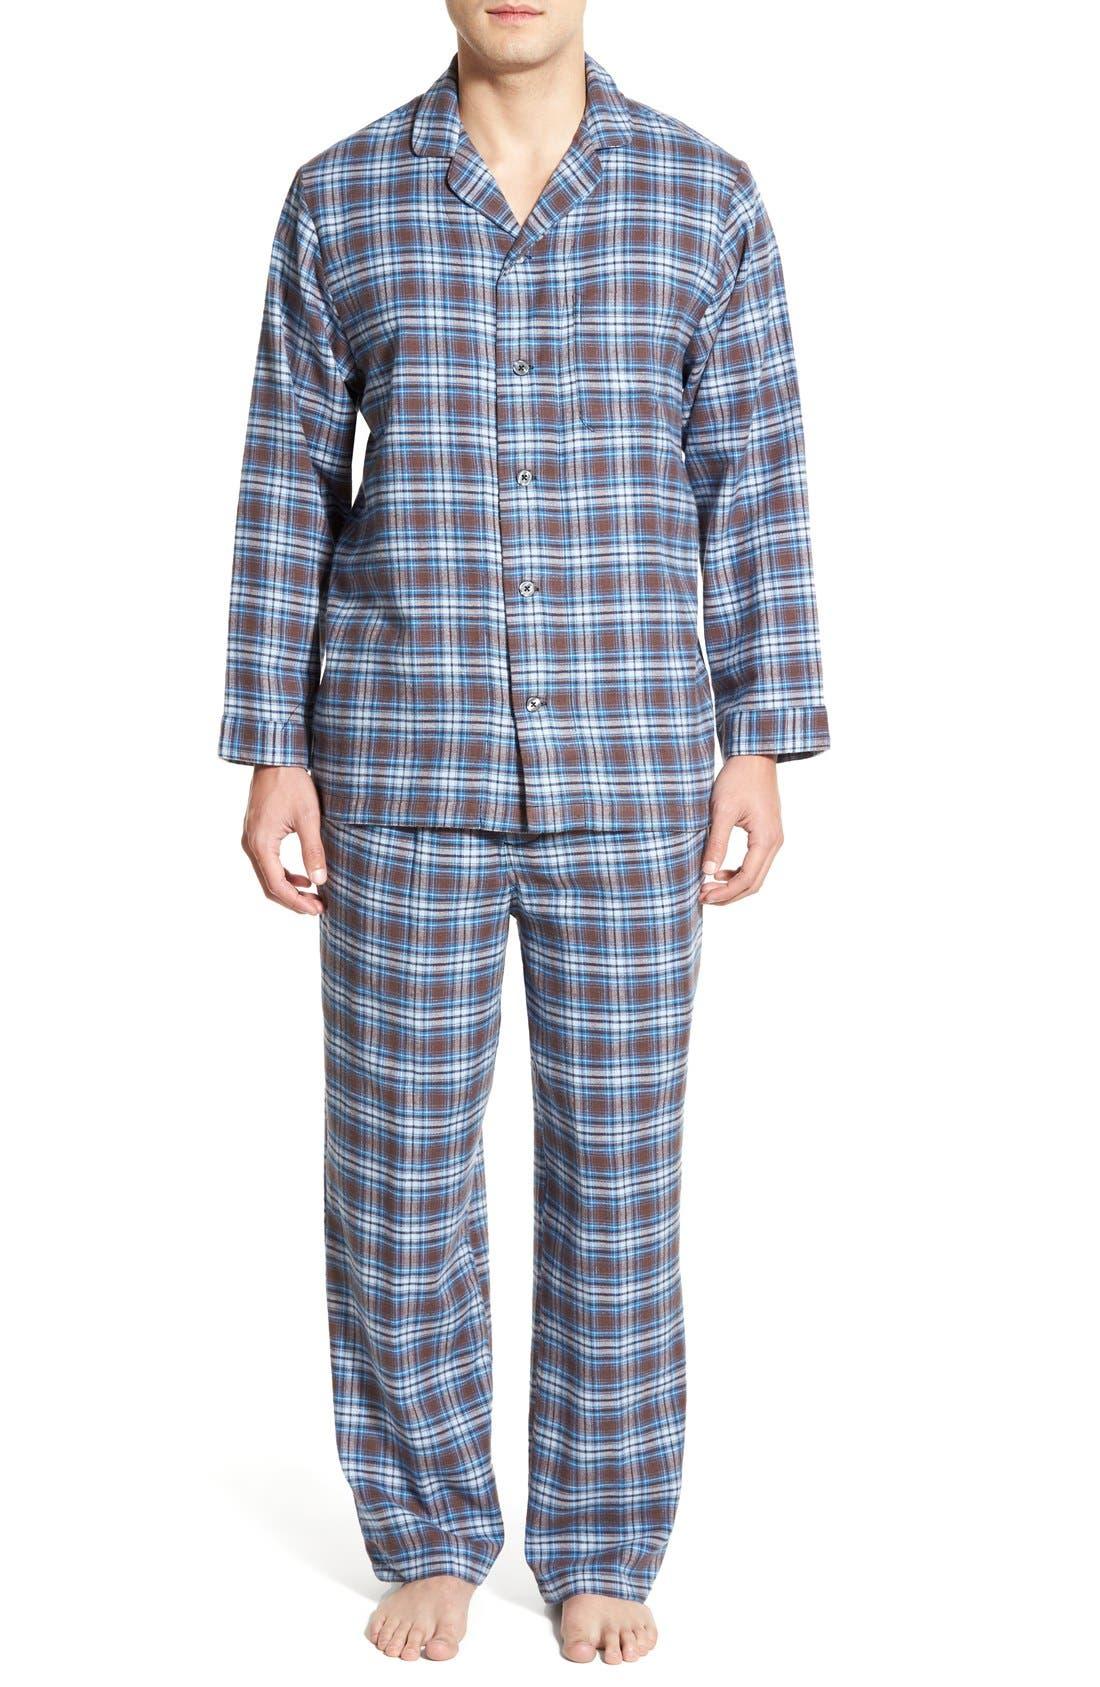 '824' Flannel Pajama Set,                             Main thumbnail 26, color,